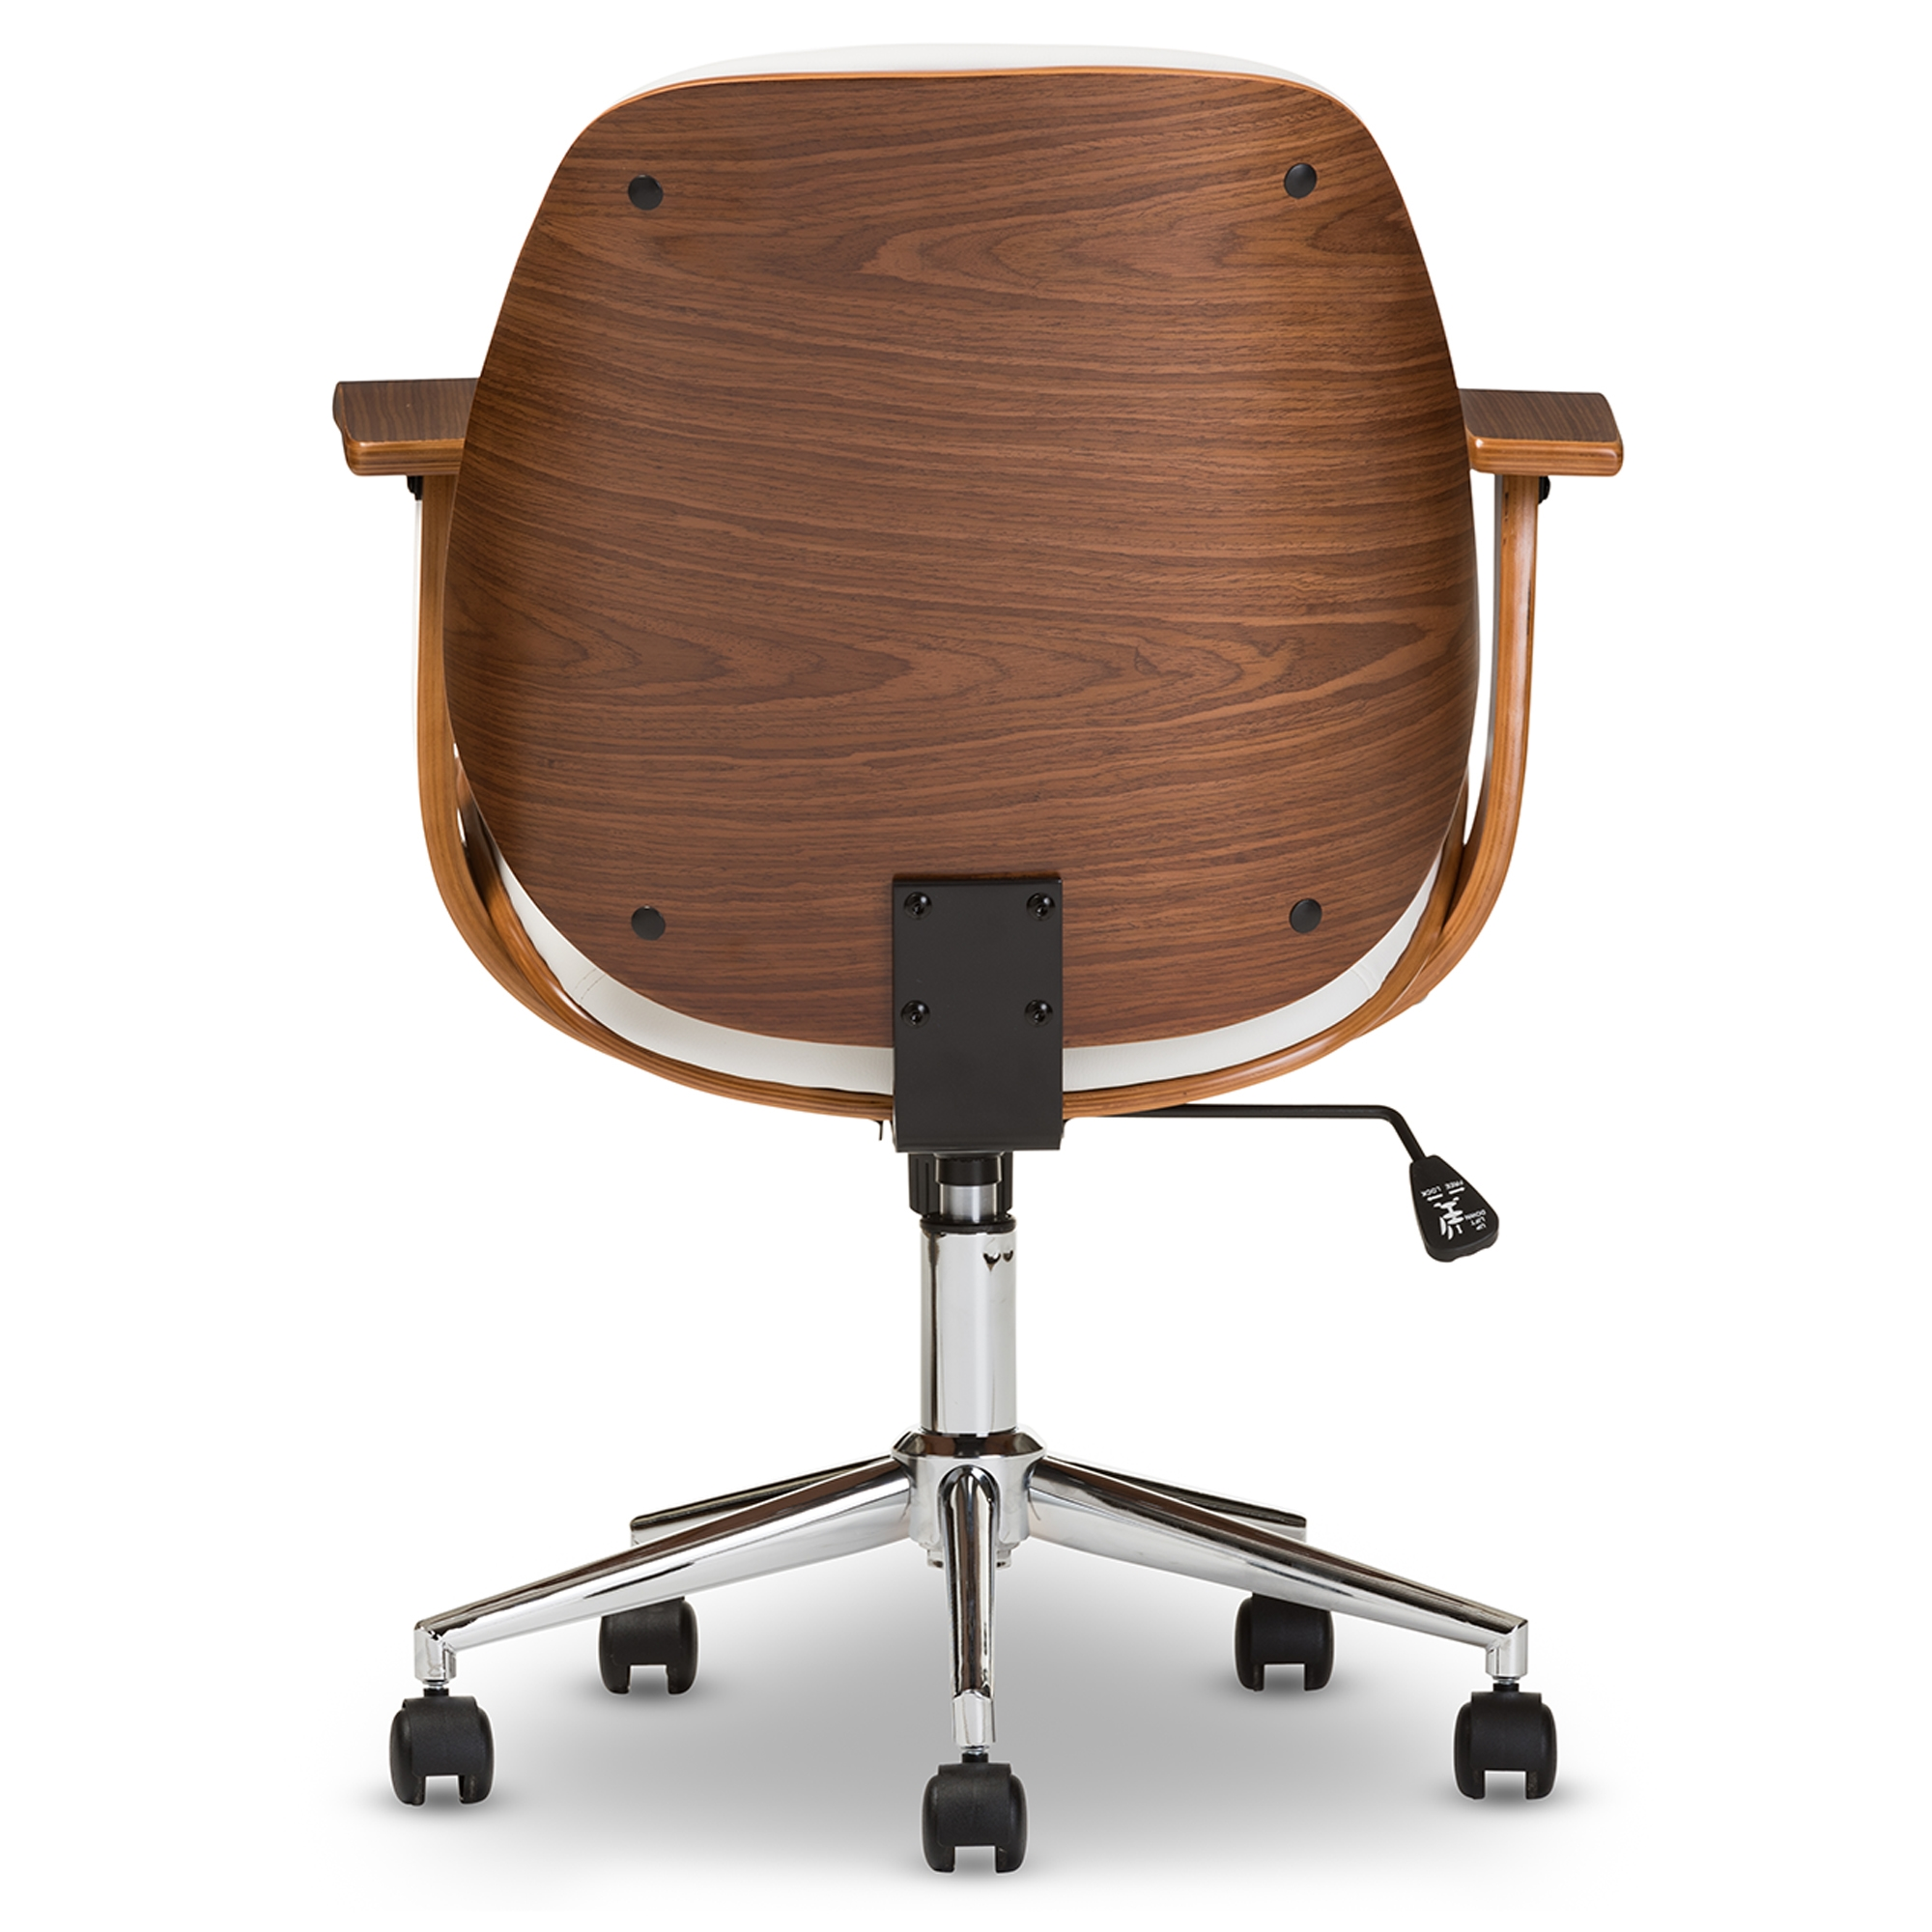 white walnut office furniture. Baxton Studio Rathburn Modern And Contemporary White Walnut Office Chair - SD-2235- Furniture